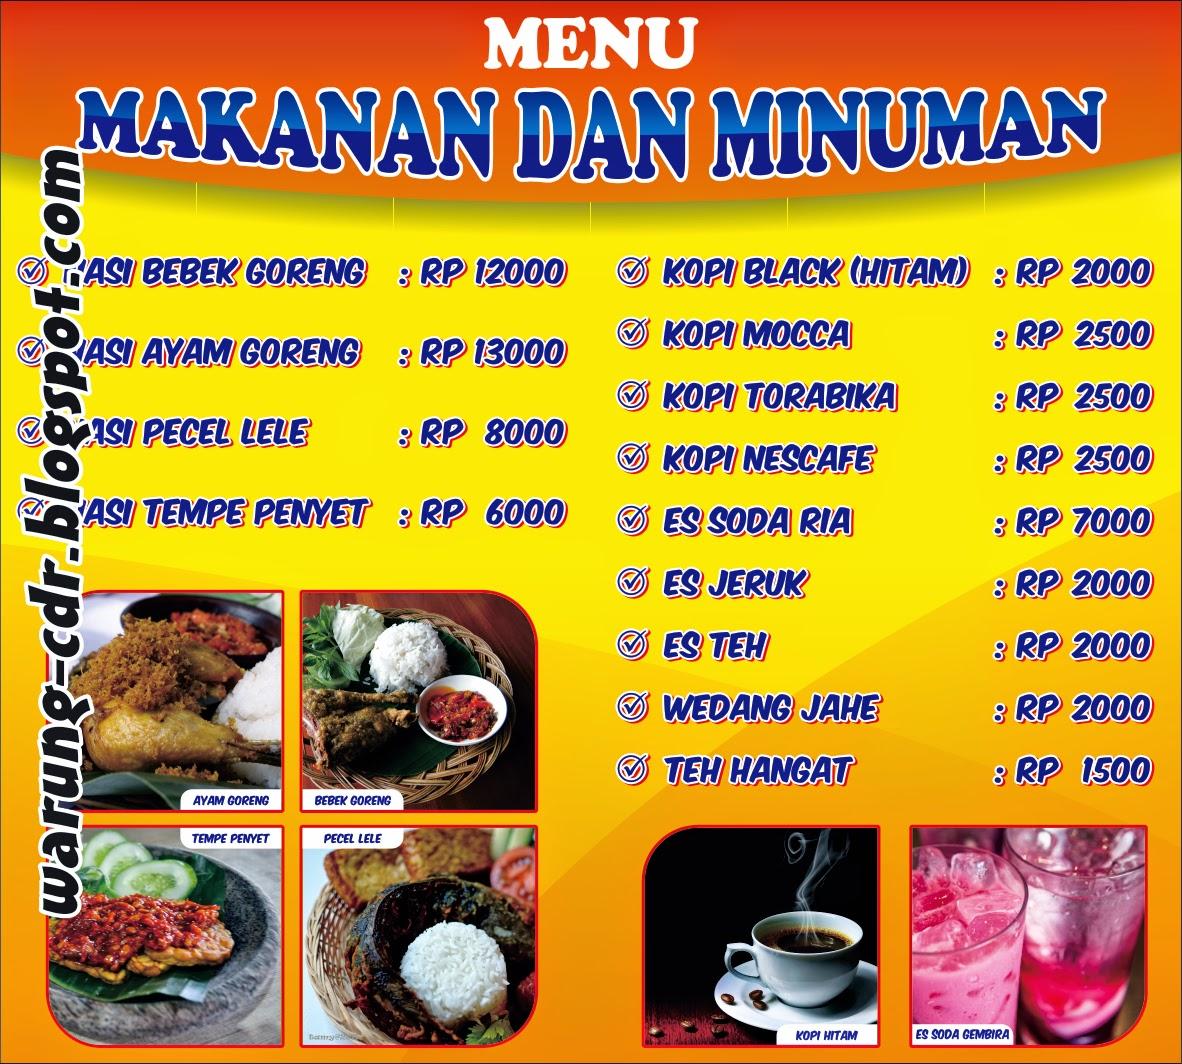 Contoh Banner Warung Menu Makanan Dan Minuman Warung Cdr